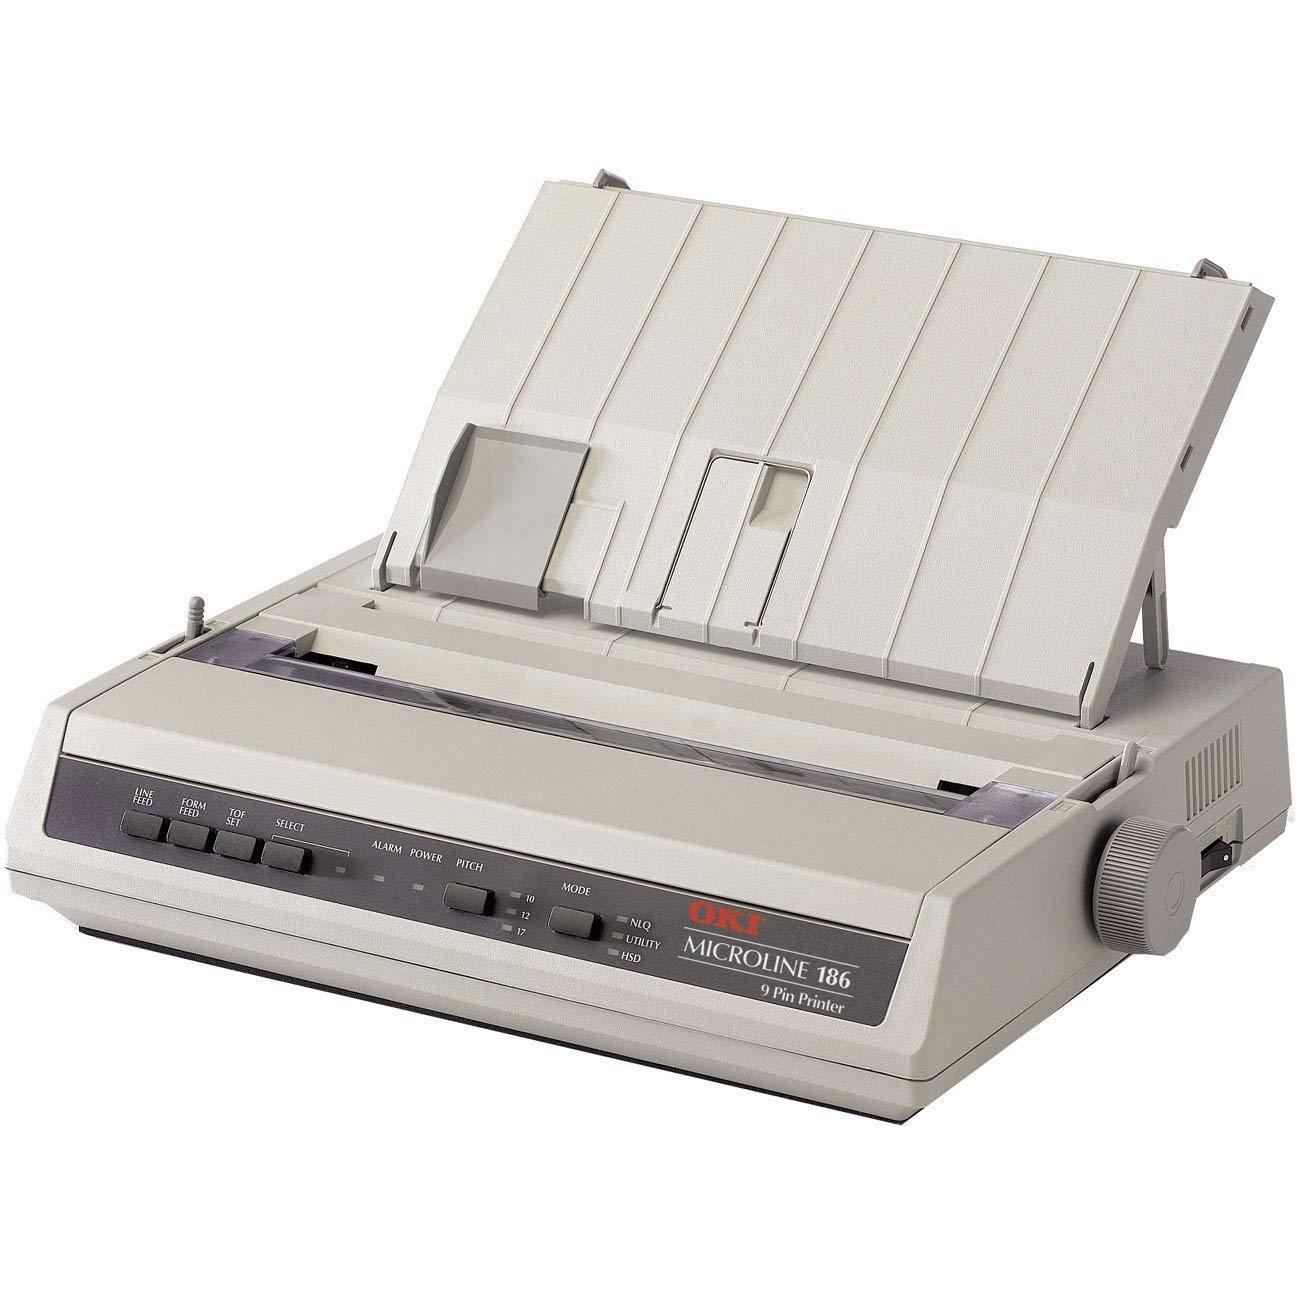 Oki MICROLINE 186 Dot Matrix Printer (62422401) (Renewed)